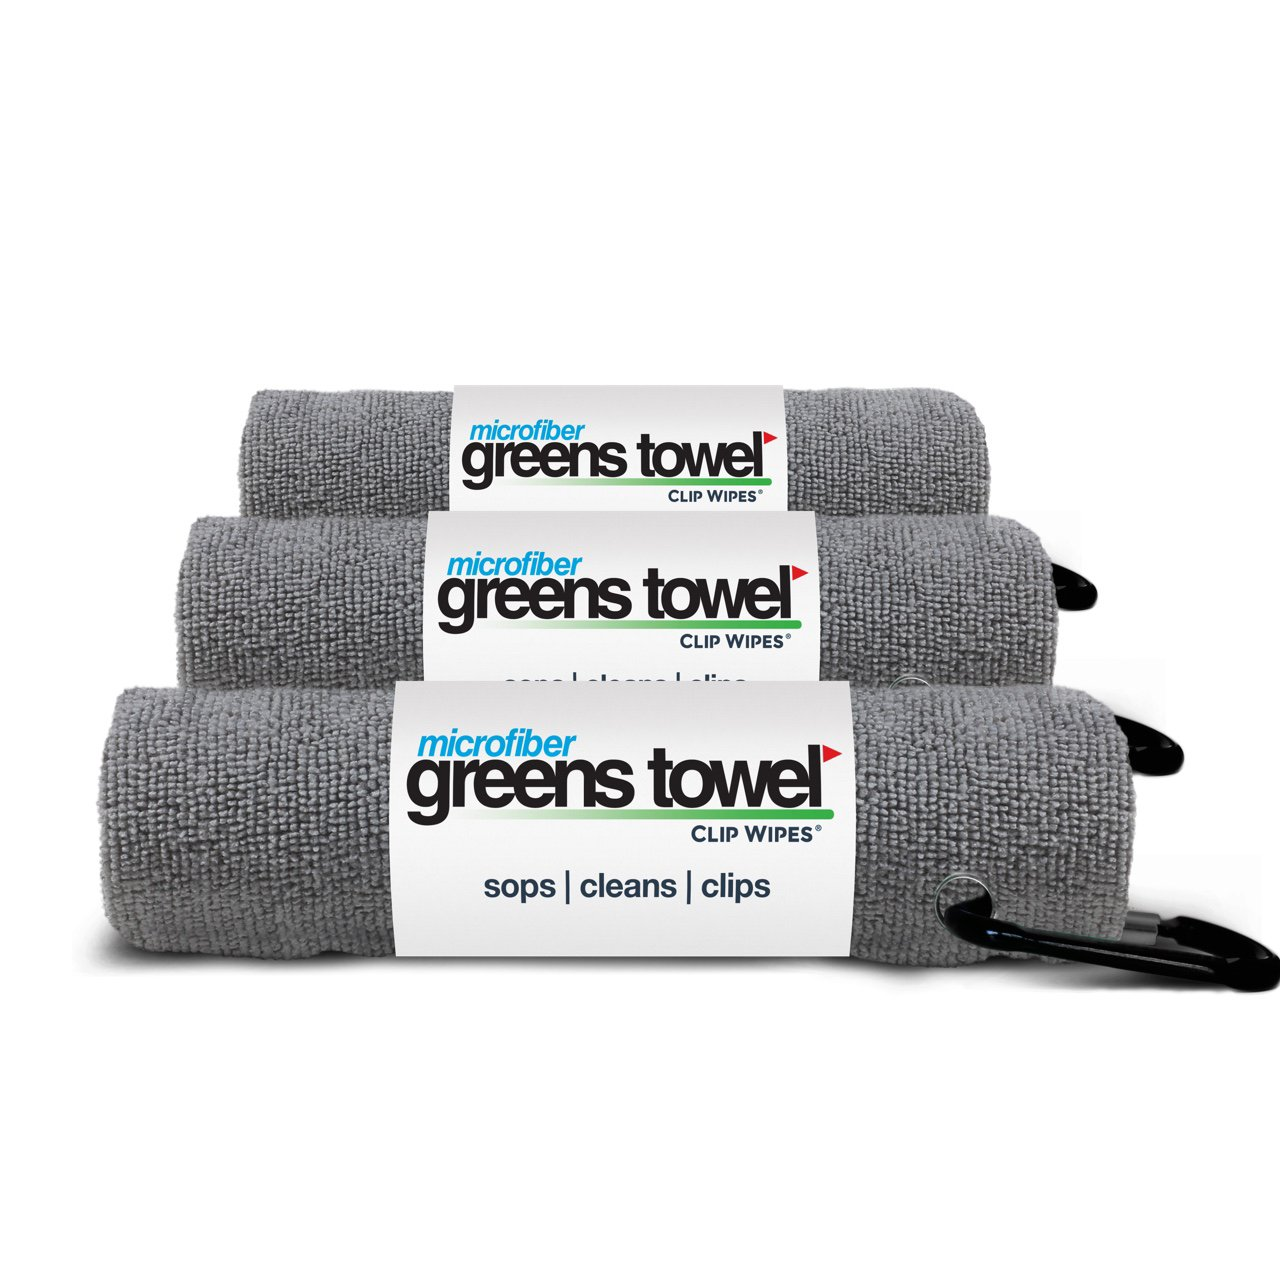 3 Pack of Sterling Silver Microfiber Golf Towels by Greens Towel